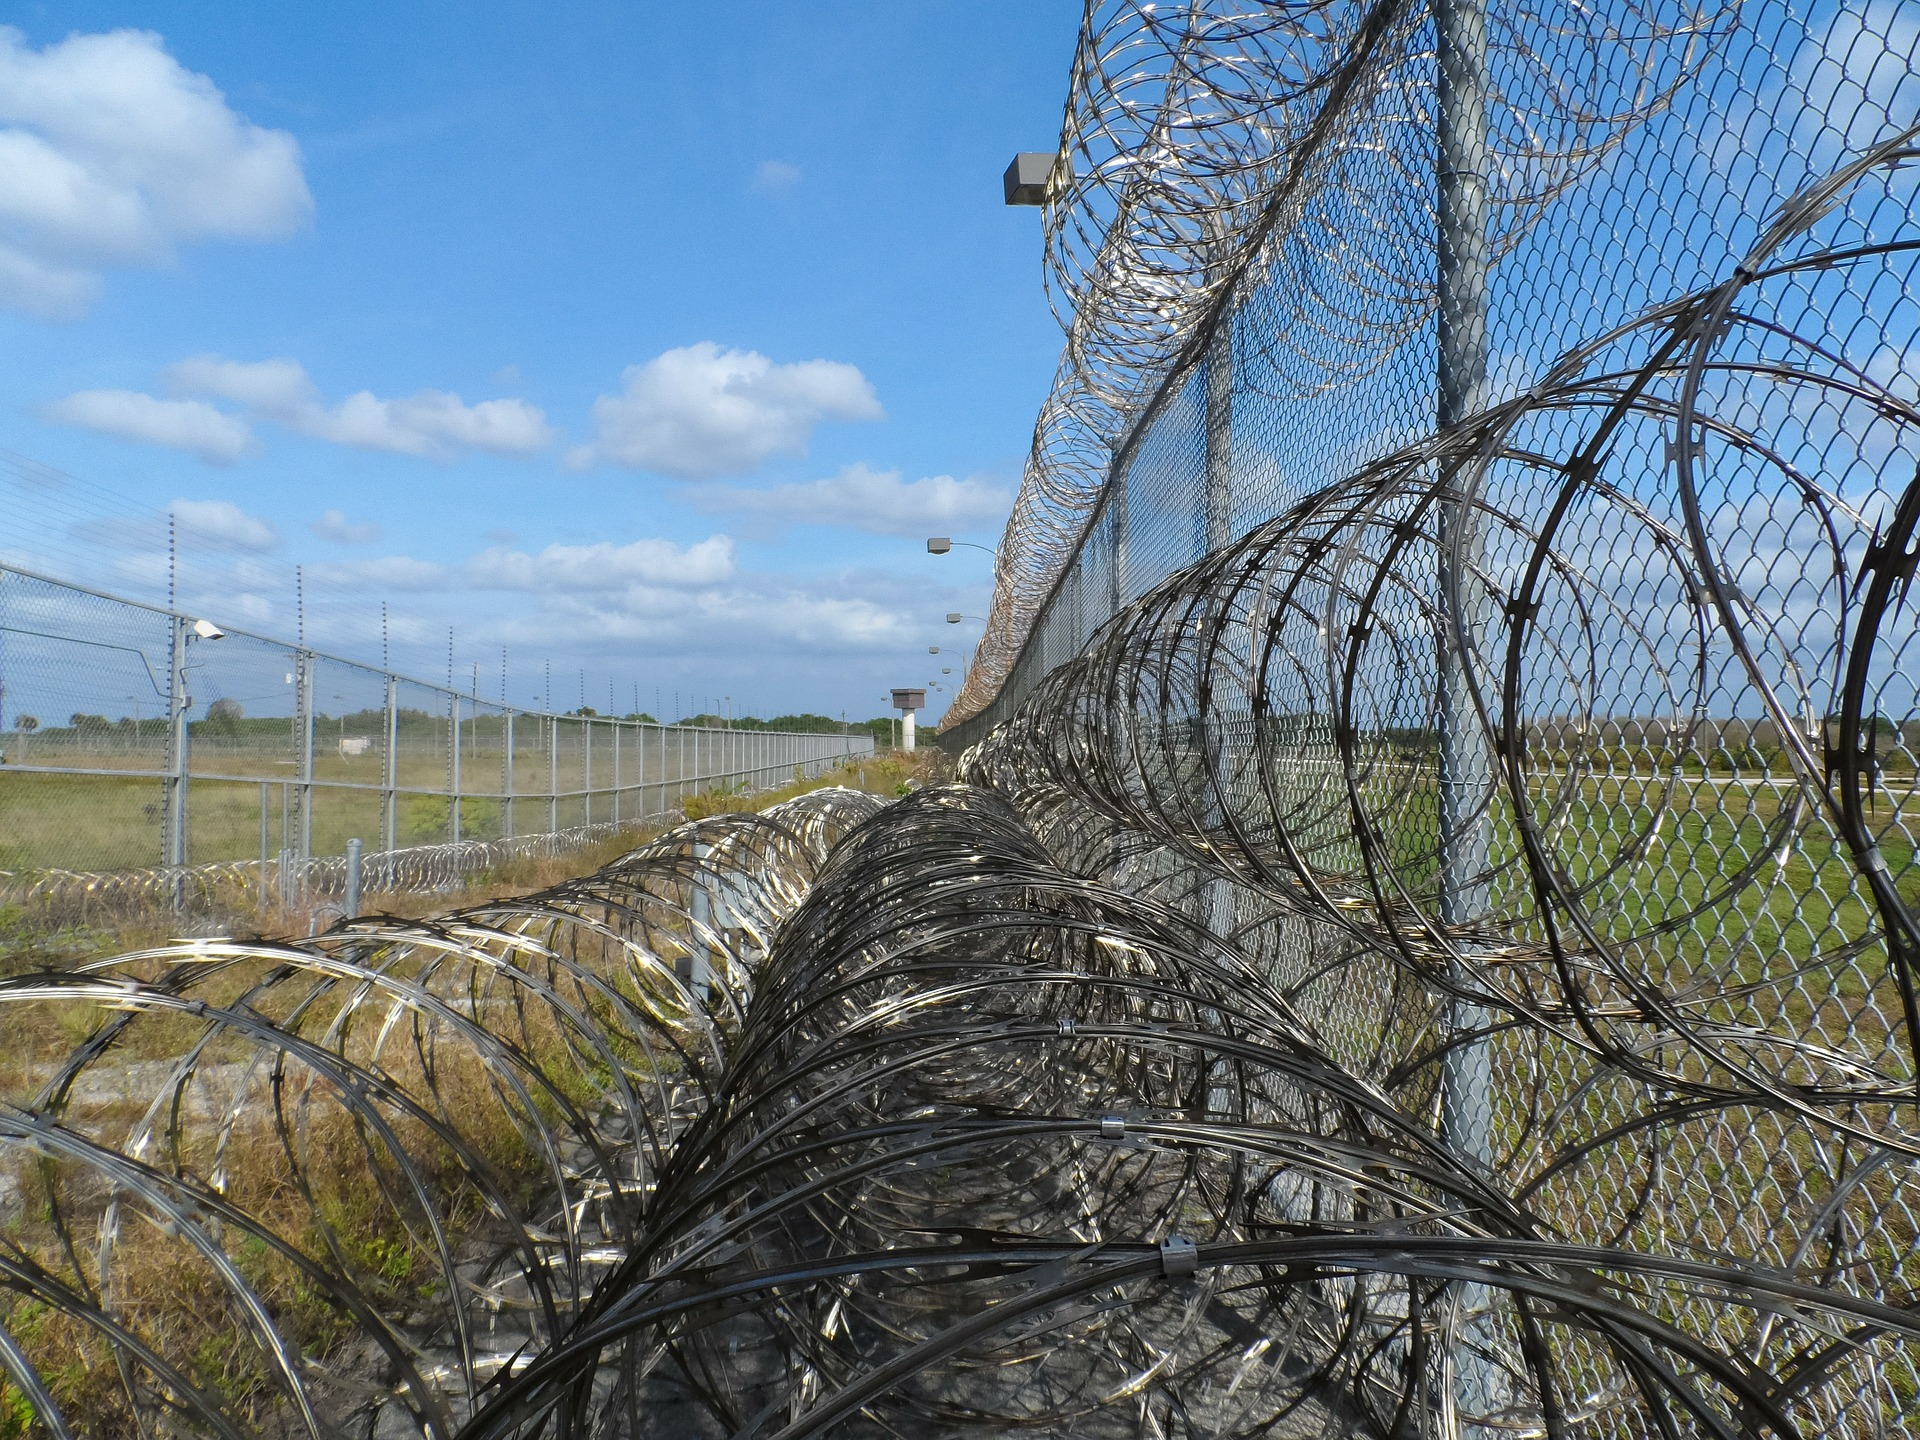 prison-fence-218459_1920